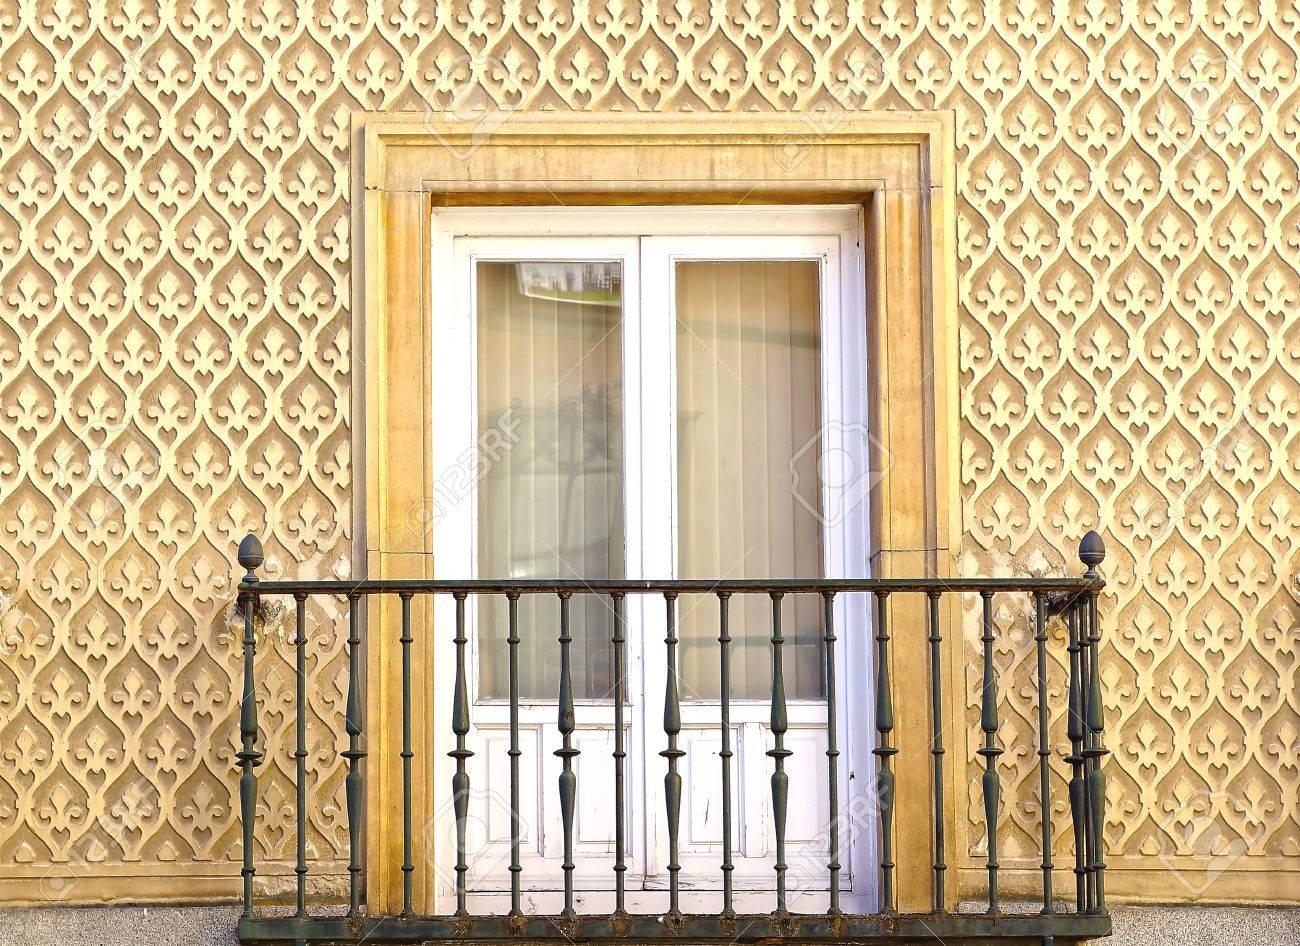 Moorish Floral Wall Decoration In Segovia, Spain Stock Photo ...